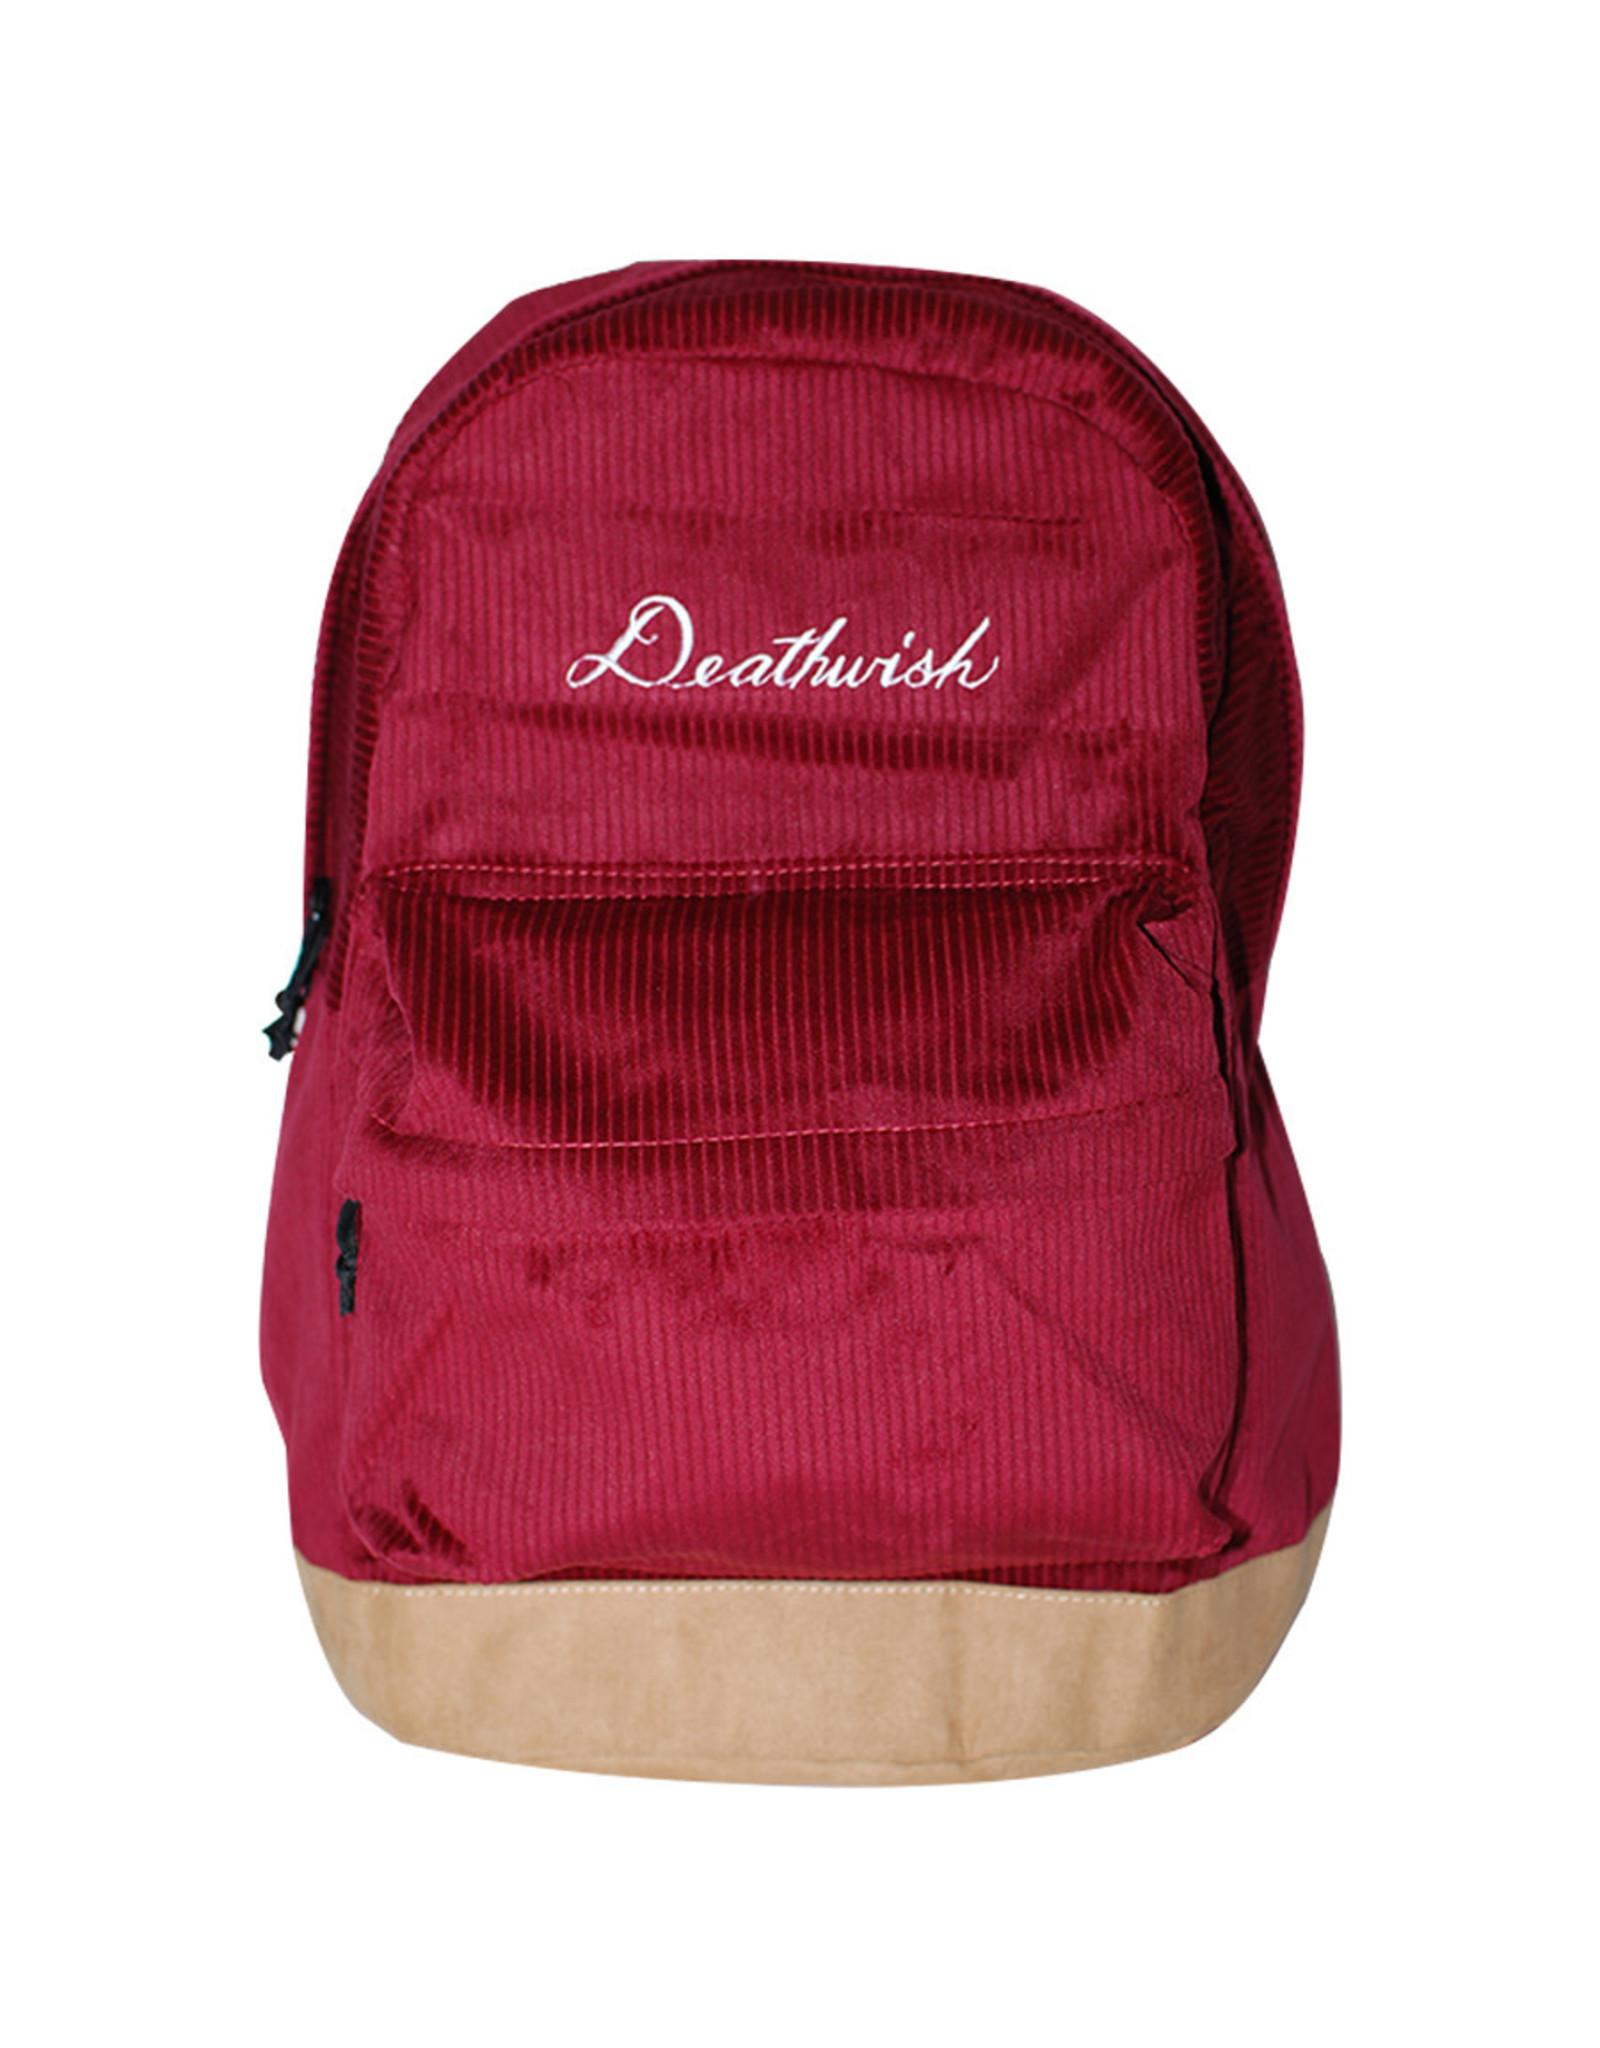 Deathwish Deathwish Backpack Script Cord (Burgundy)